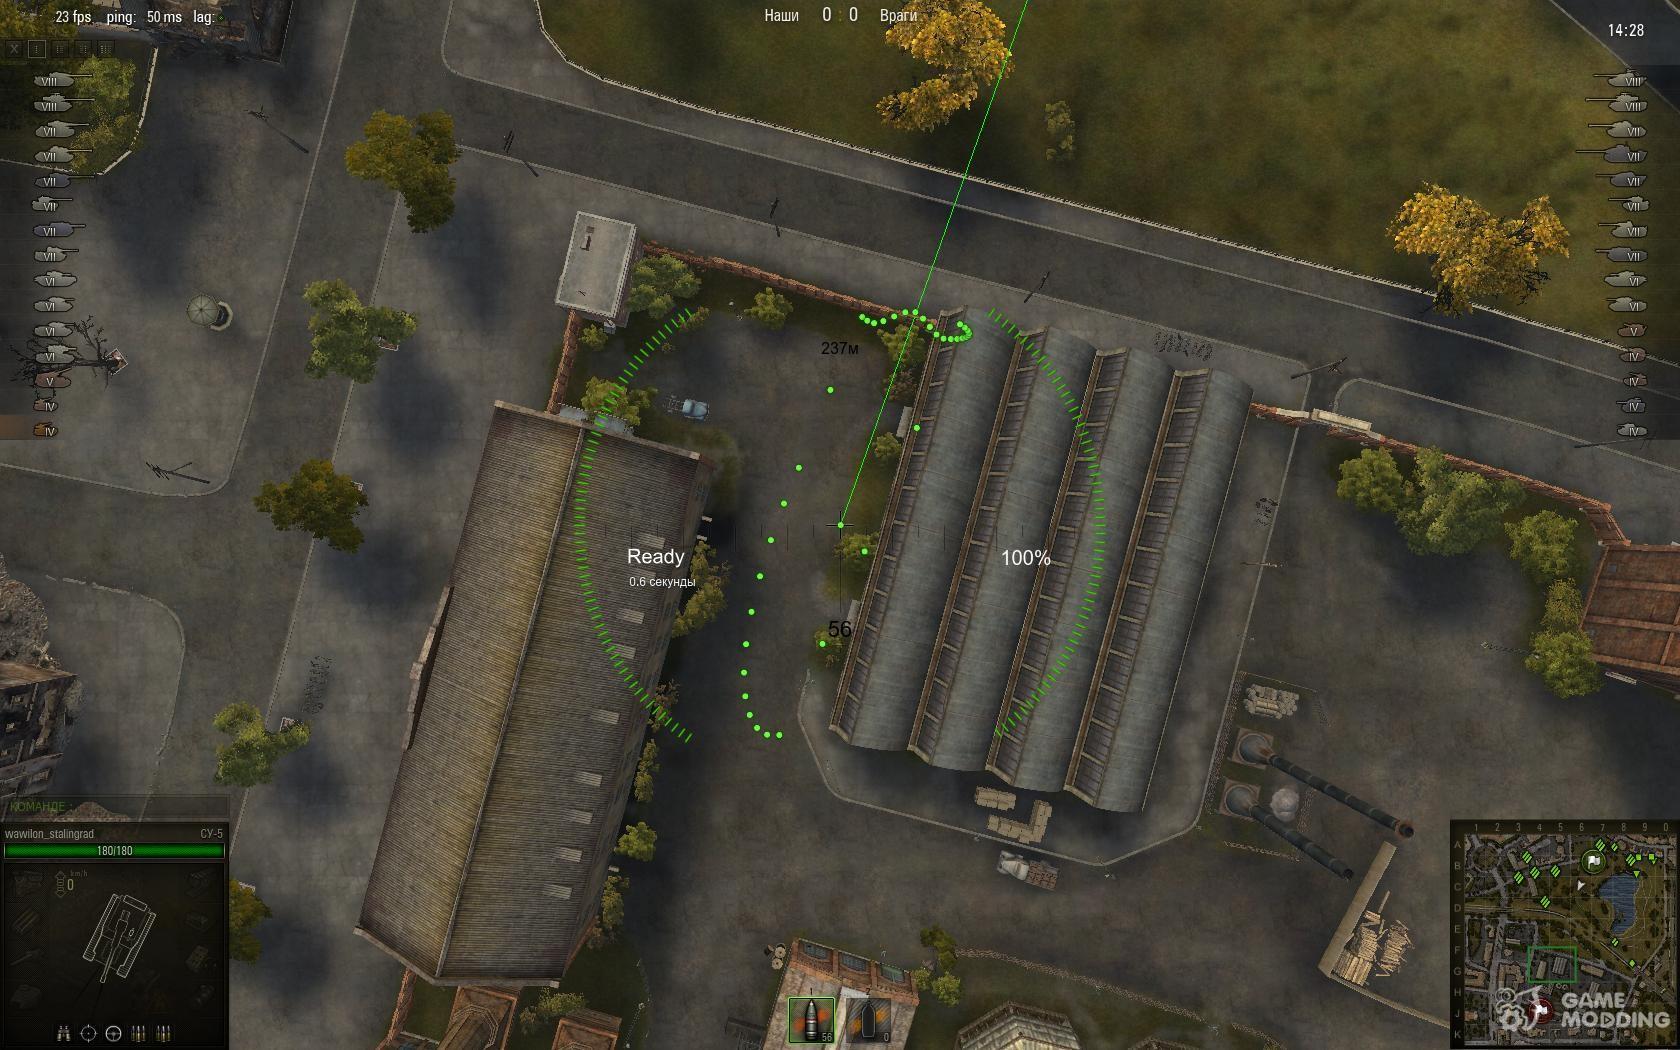 world of tanks spg sniper mod